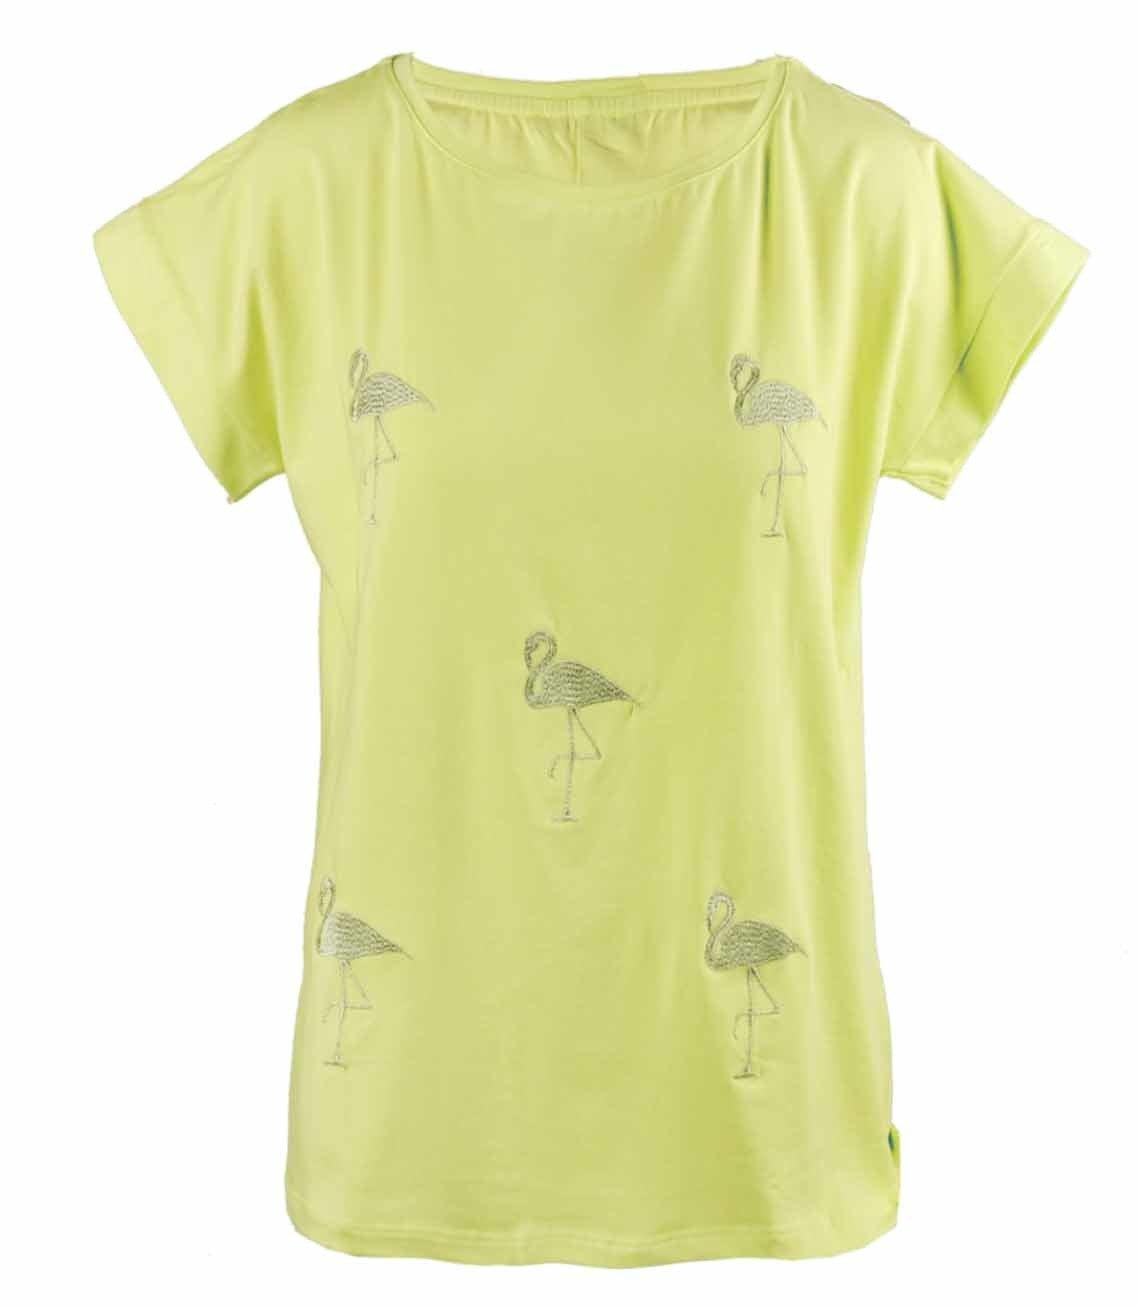 d57b6544da Fajna bluzka t-shirt pelikany Super jakość